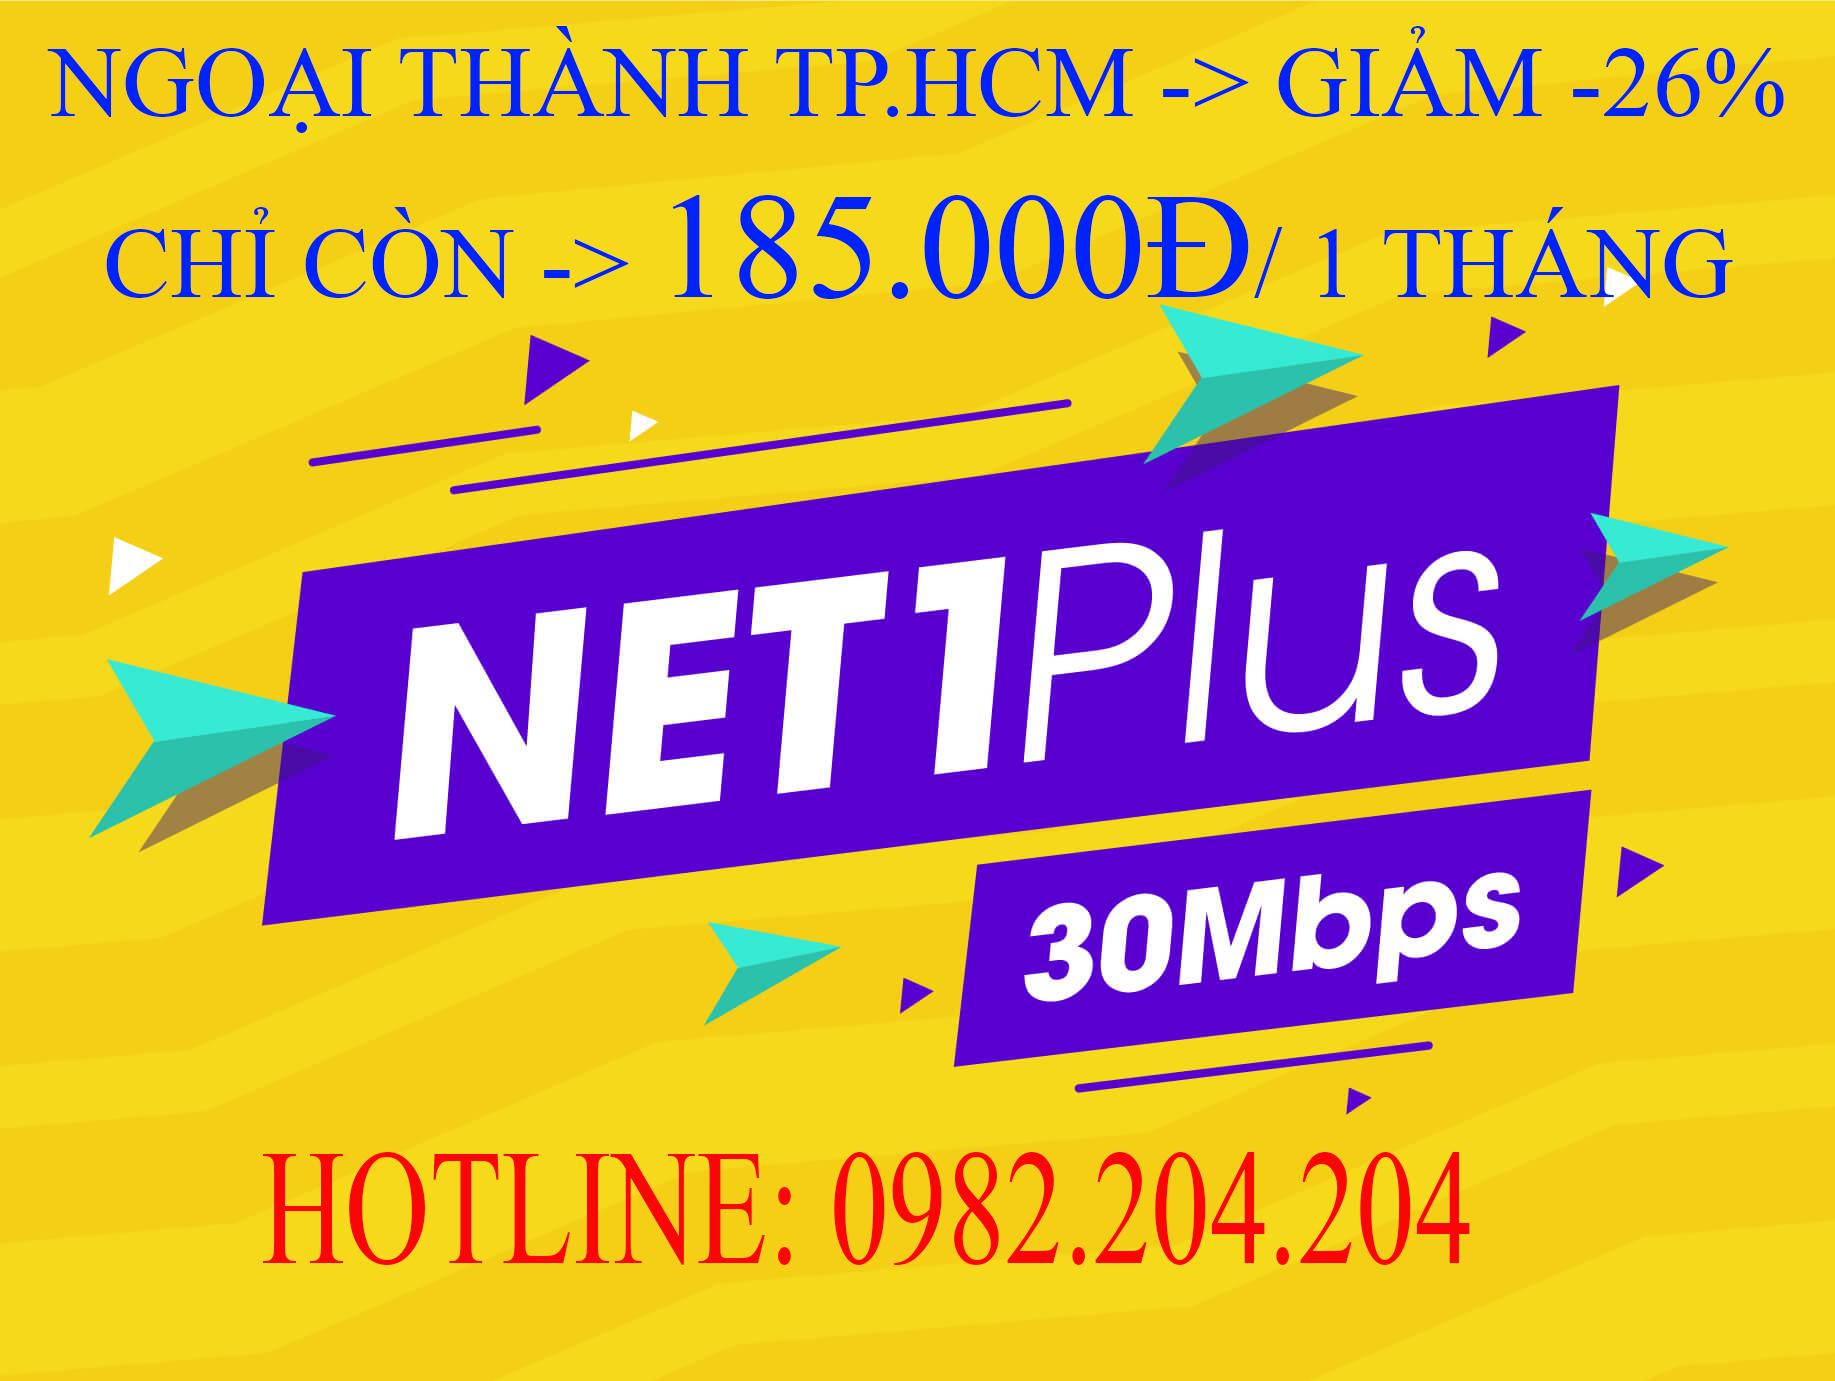 Lắp Wifi Giá Rẻ TPHCM Gói Net 1 plus Viettel 30 Mbps